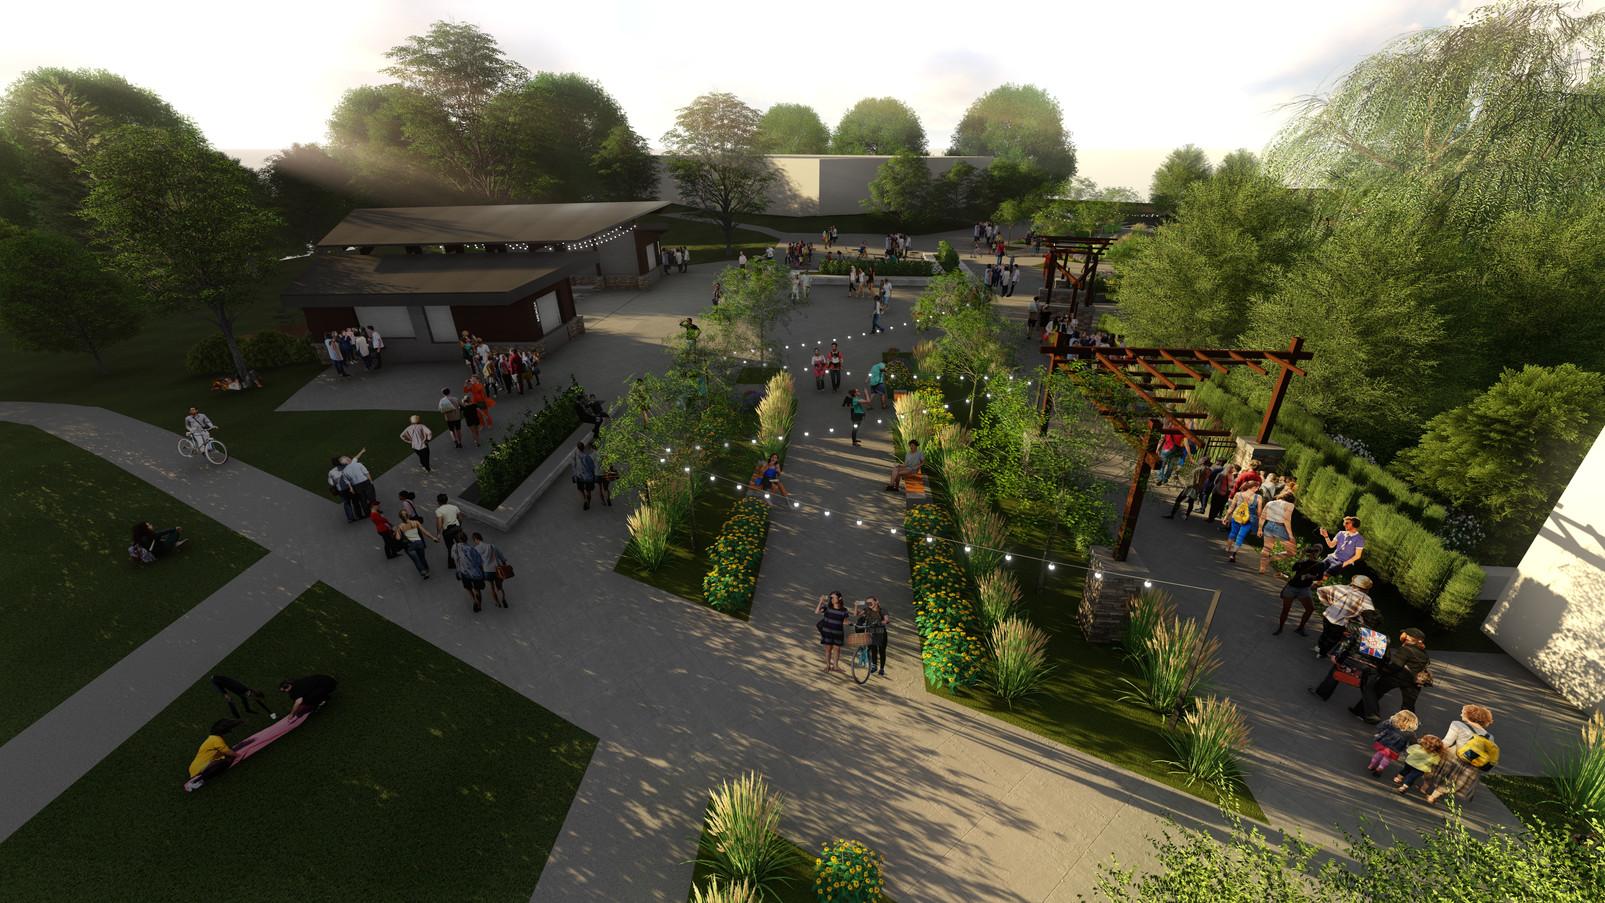 Layton Kenley Pavilion & Amphitheater re